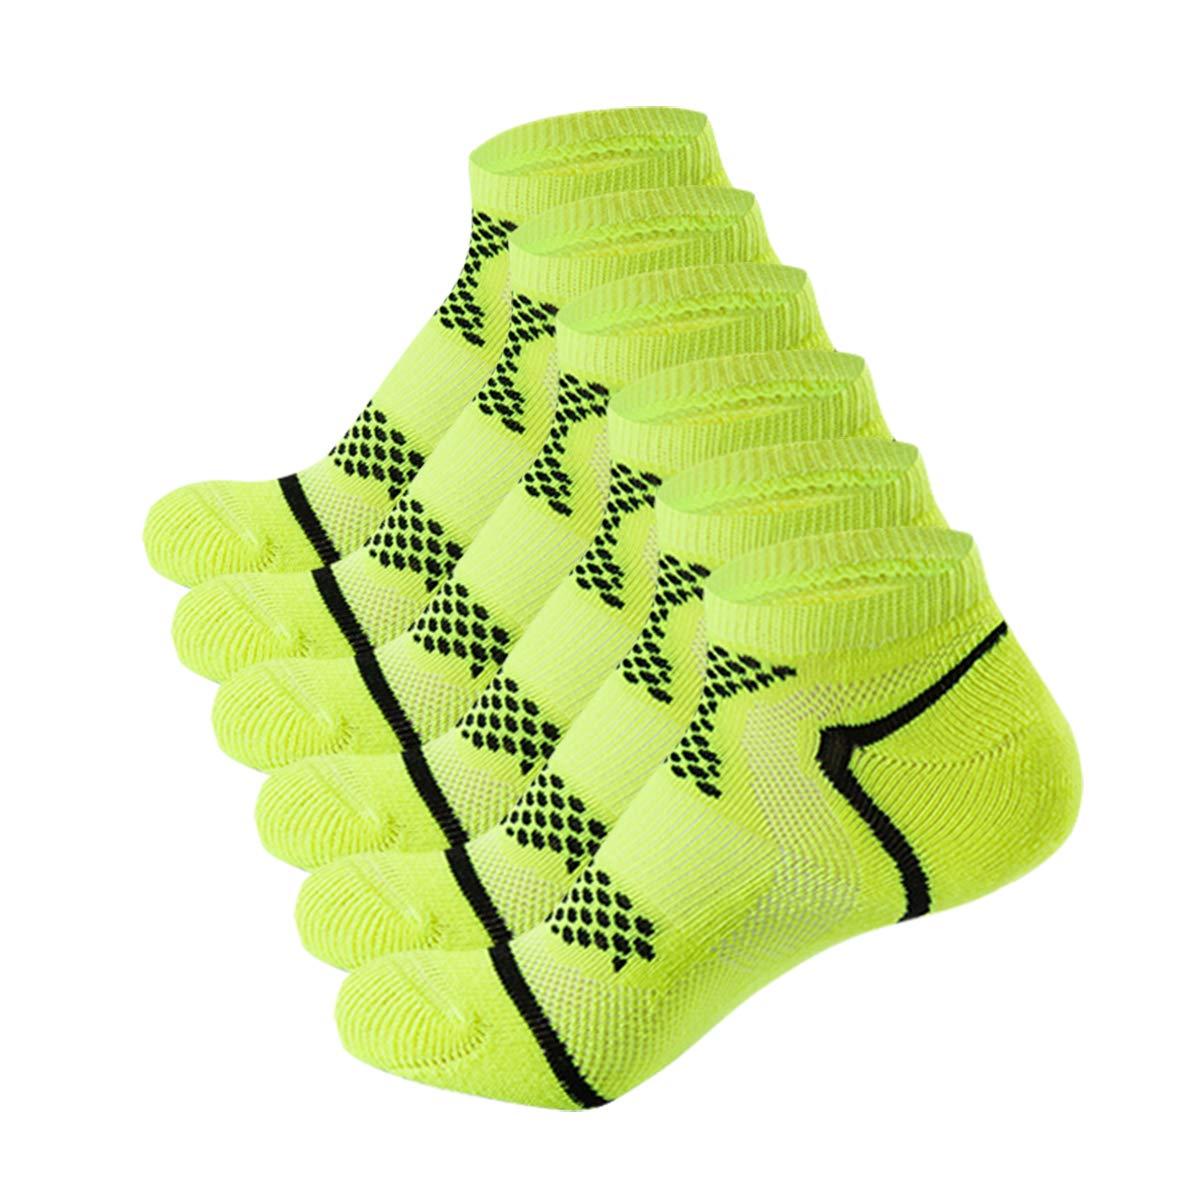 AIRSTROLL Athletic Socks Low Cut Mens Women Running Socks No Show Ankle Socks Performance Cushioned Tab Socks 6 Pairs (Green, S/M)